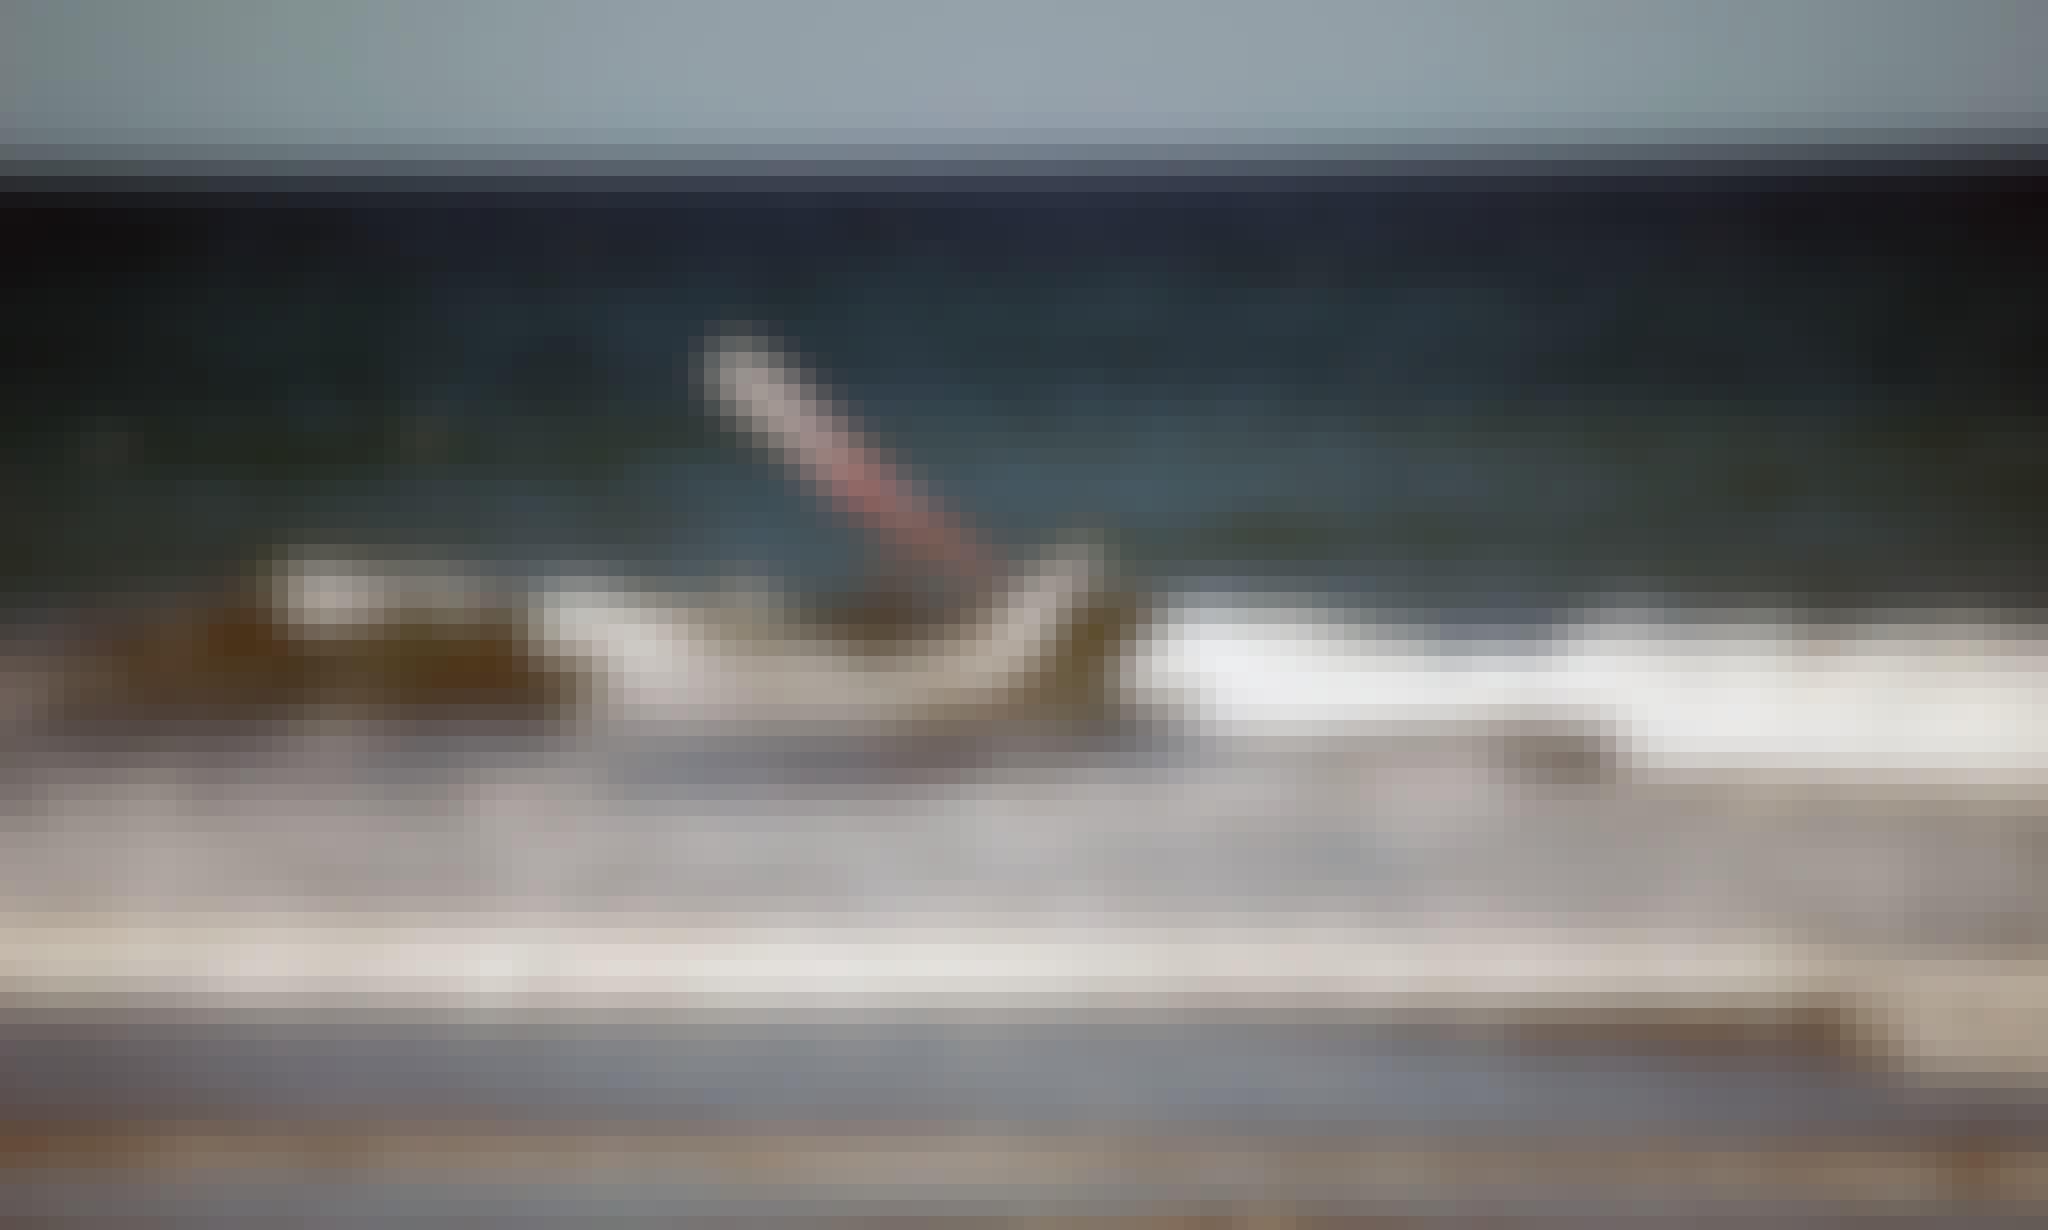 Windsurfing Rental & Lessons in Wellfleet